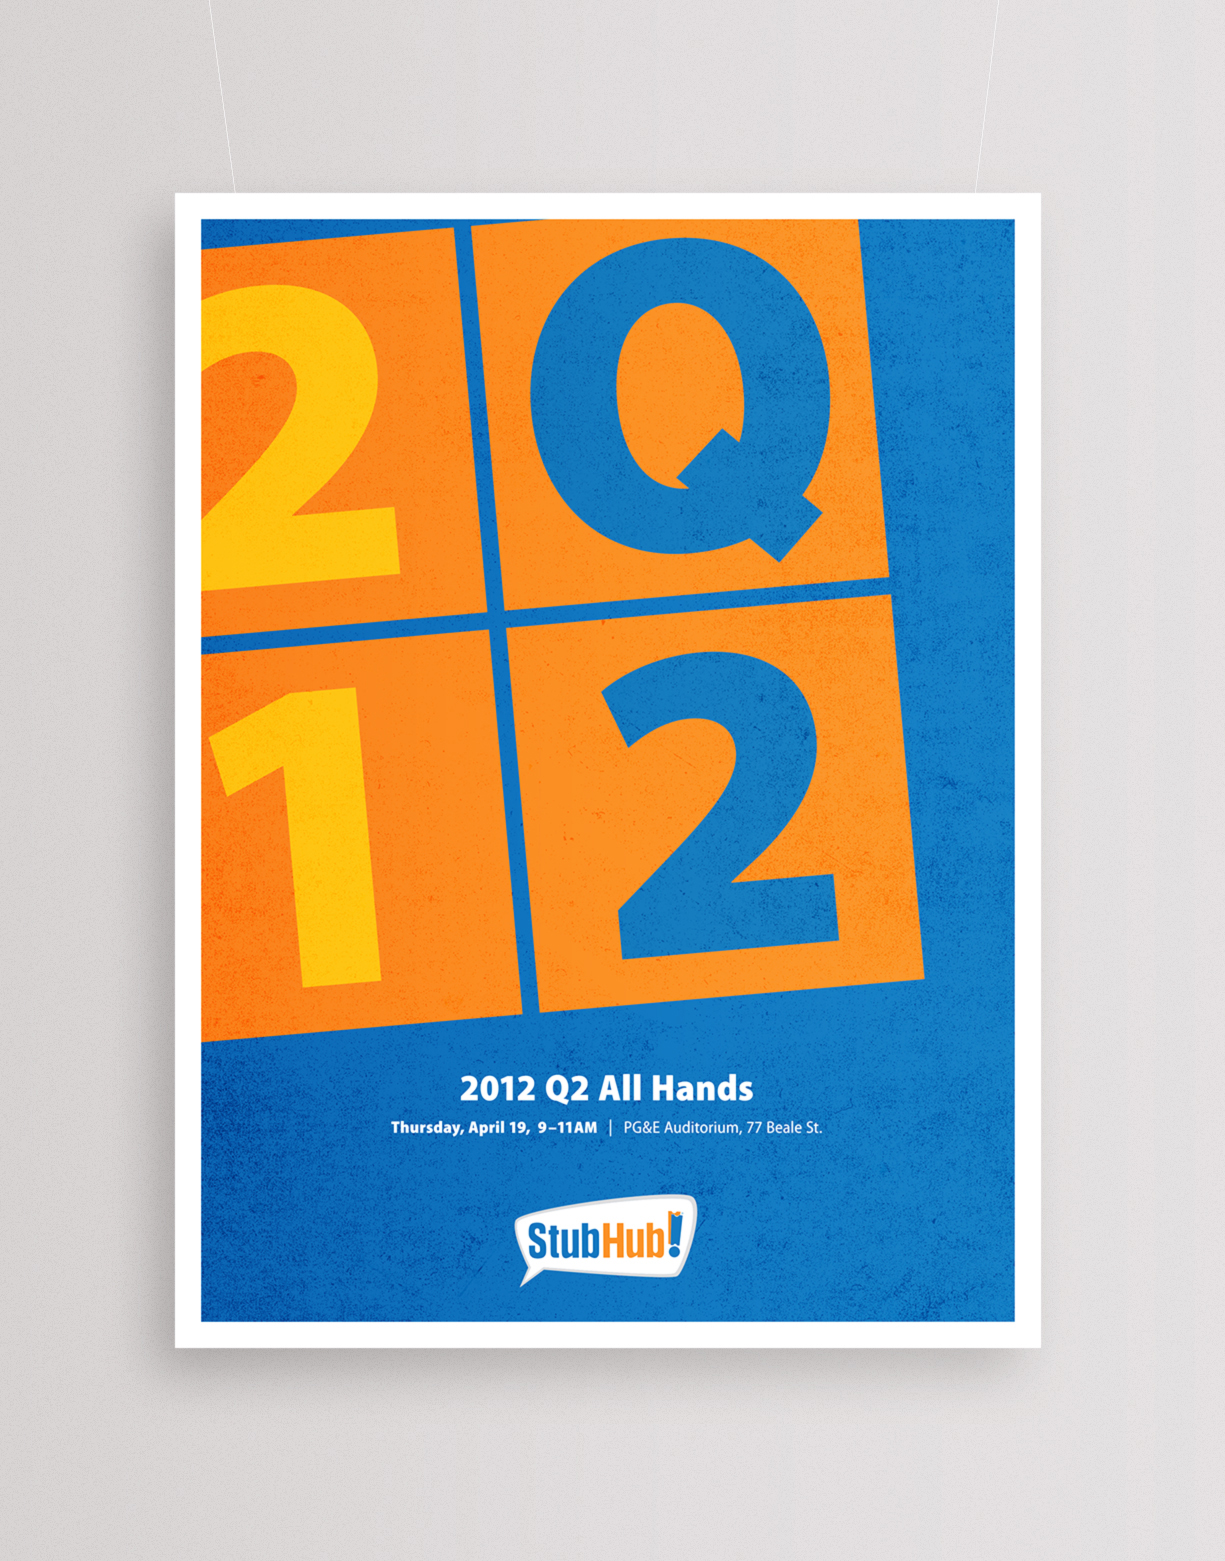 stubhub_2012-Q2_Poster.jpg